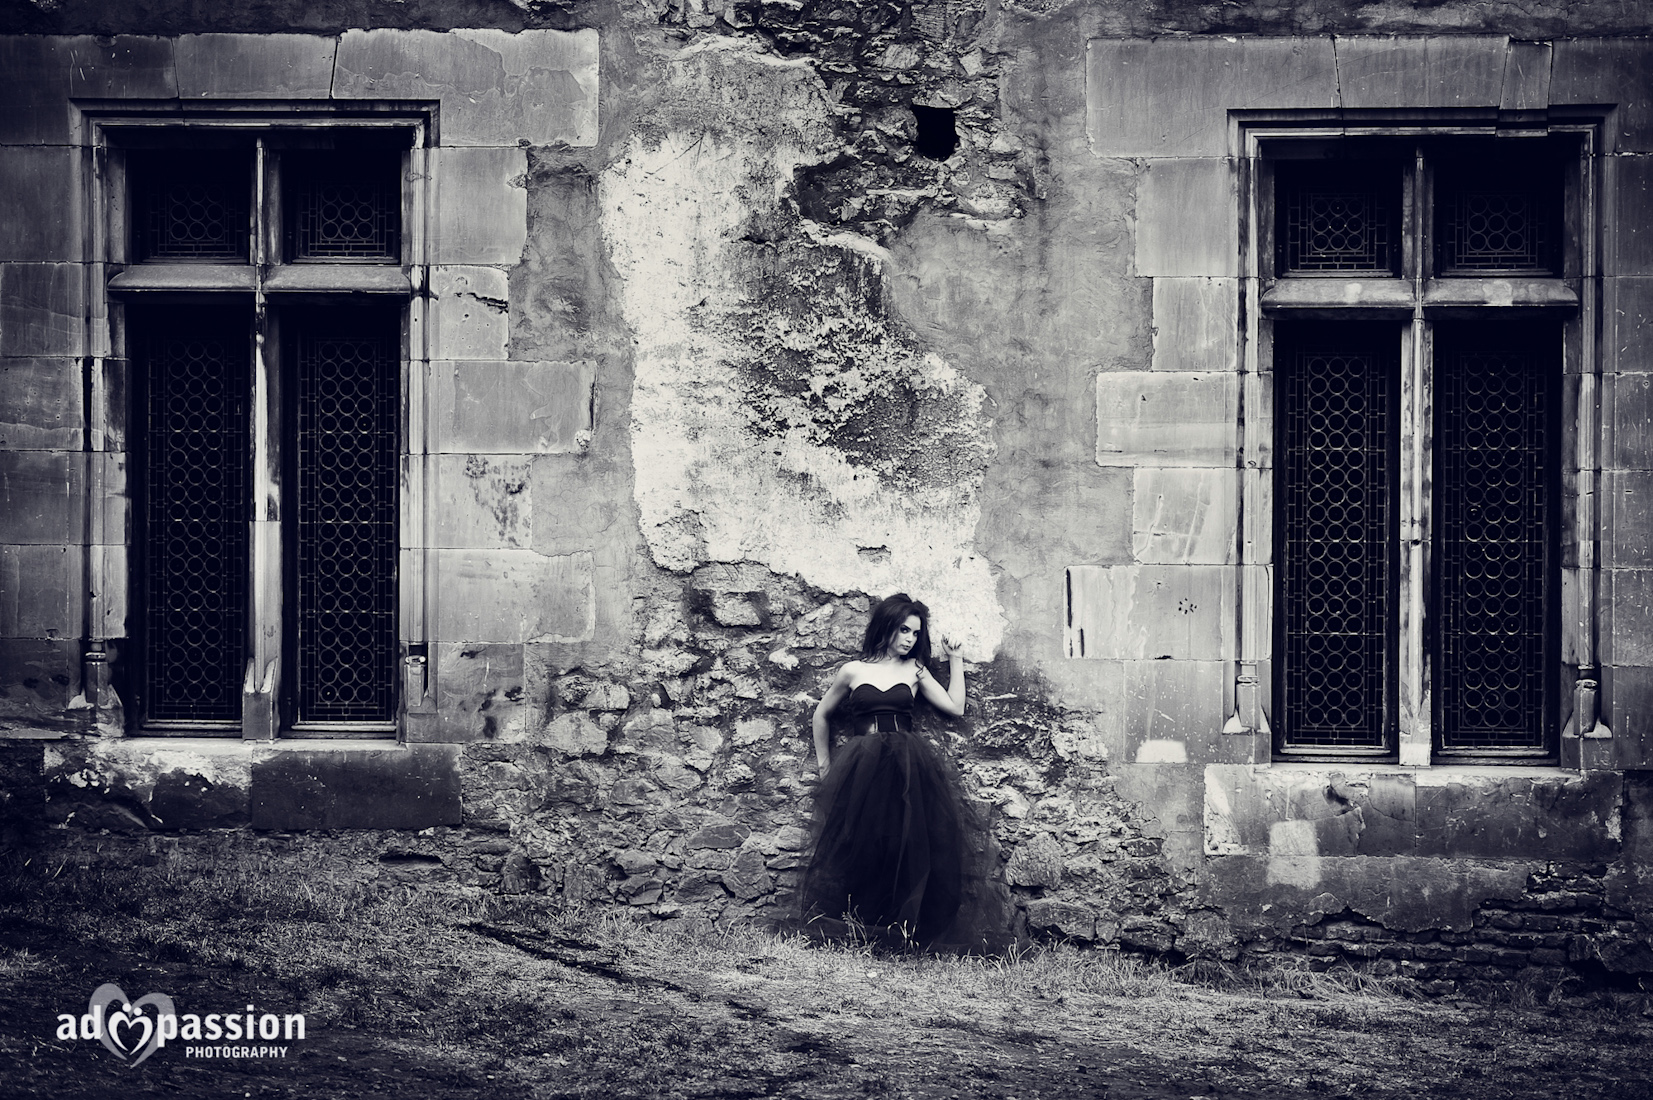 AD Passion Photography | alexandra_castelul_huniazilor_011a | Adelin, Dida, fotograf profesionist, fotograf de nunta, fotografie de nunta, fotograf Timisoara, fotograf Craiova, fotograf Bucuresti, fotograf Arad, nunta Timisoara, nunta Arad, nunta Bucuresti, nunta Craiova